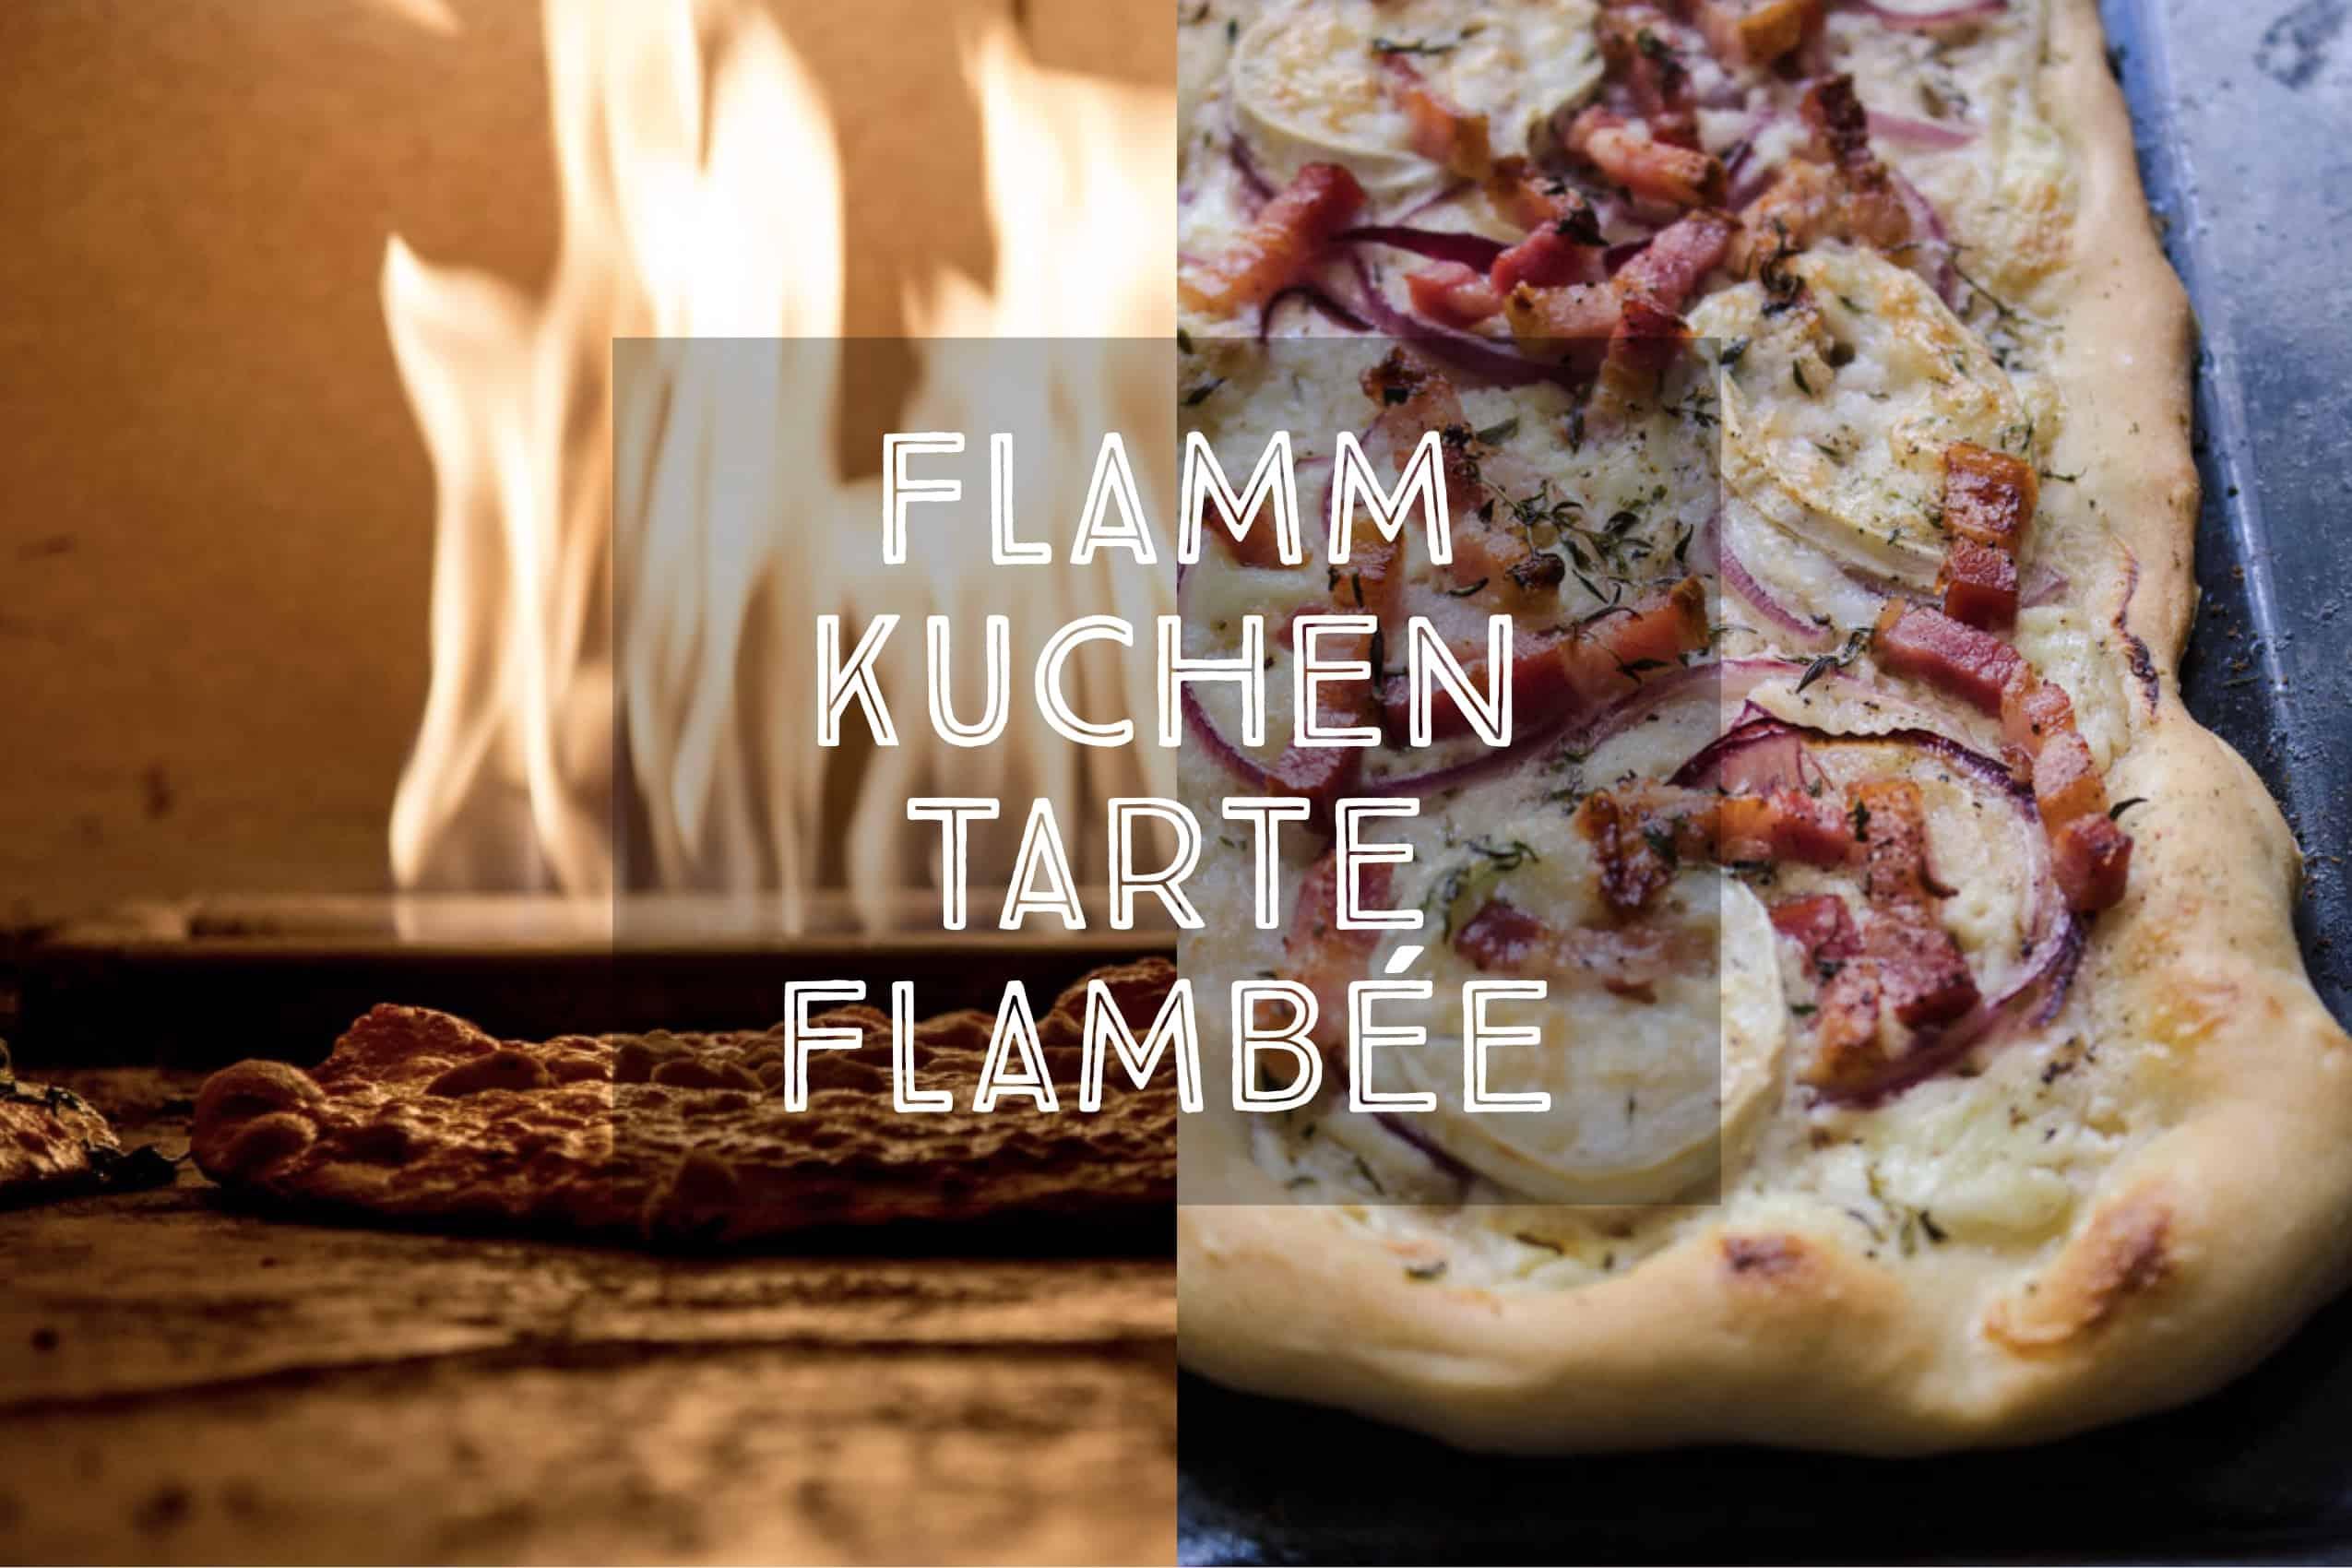 Flammkuchen Tarte Flambee